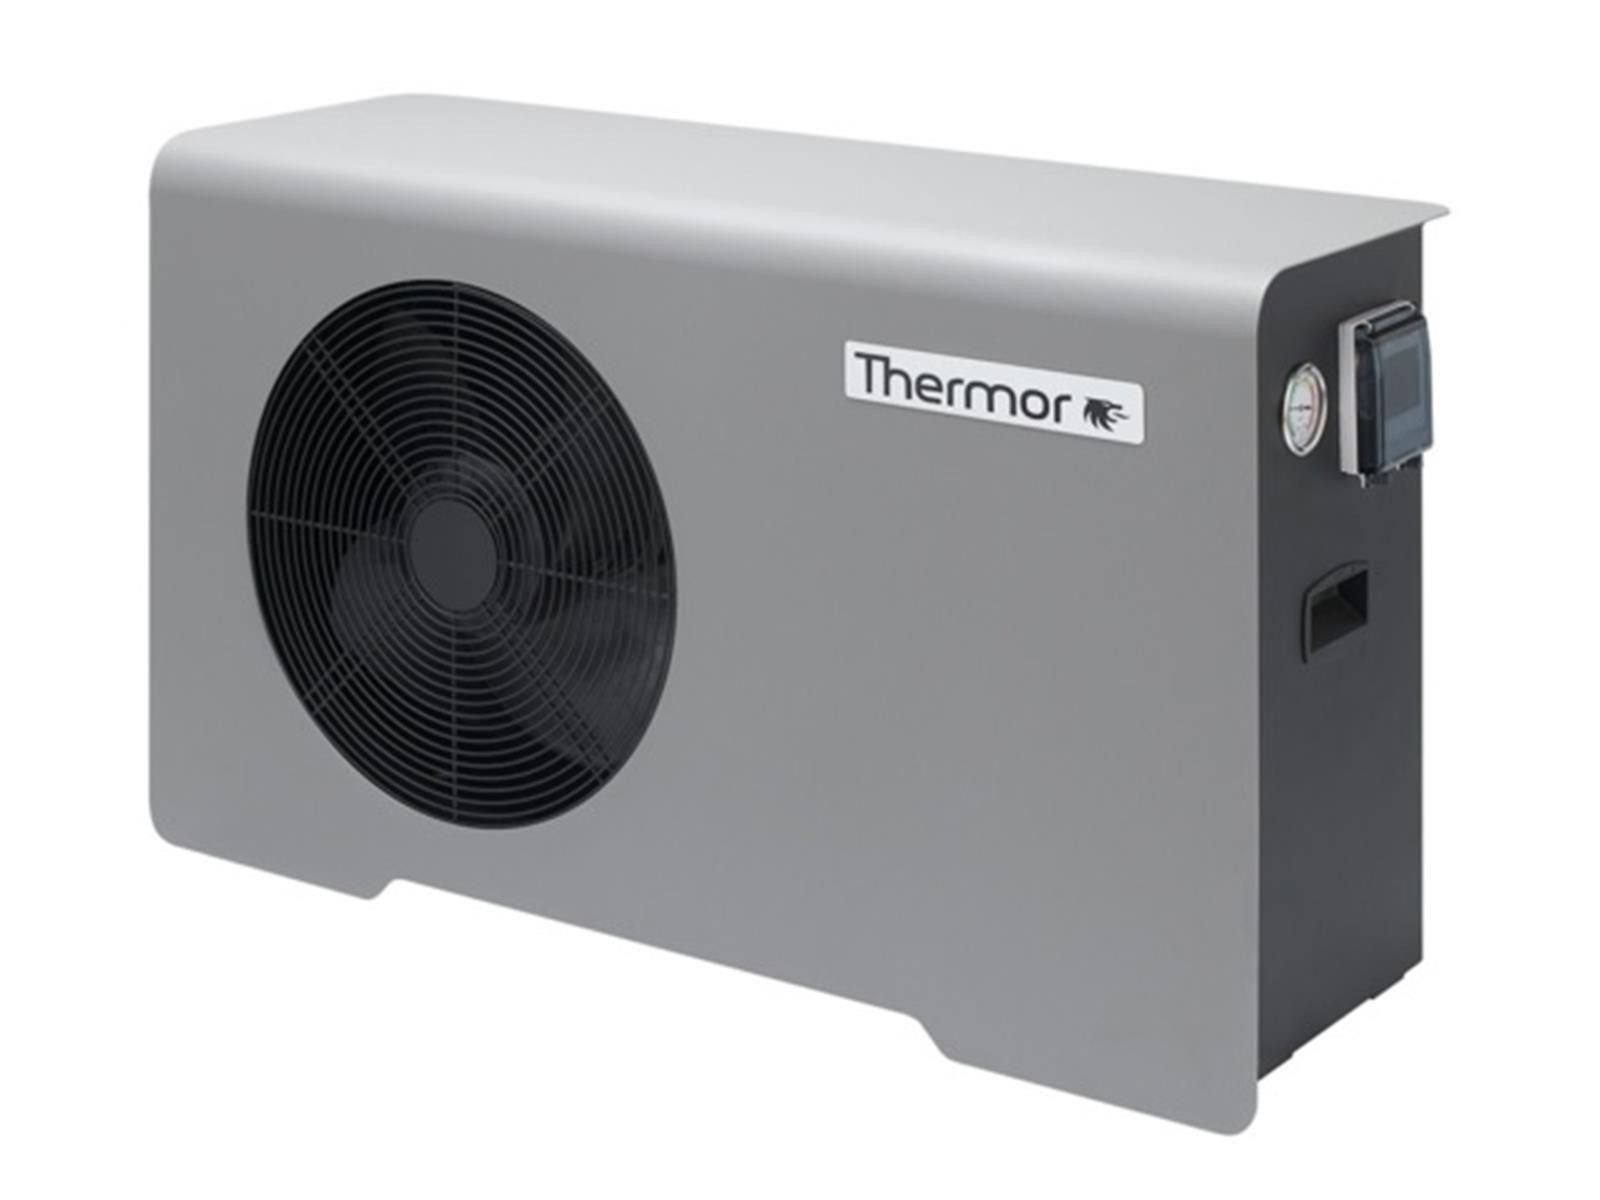 Pompe chaleur aeromax piscine mod le 12 mono pour for Pompe piscine stp 75 mono